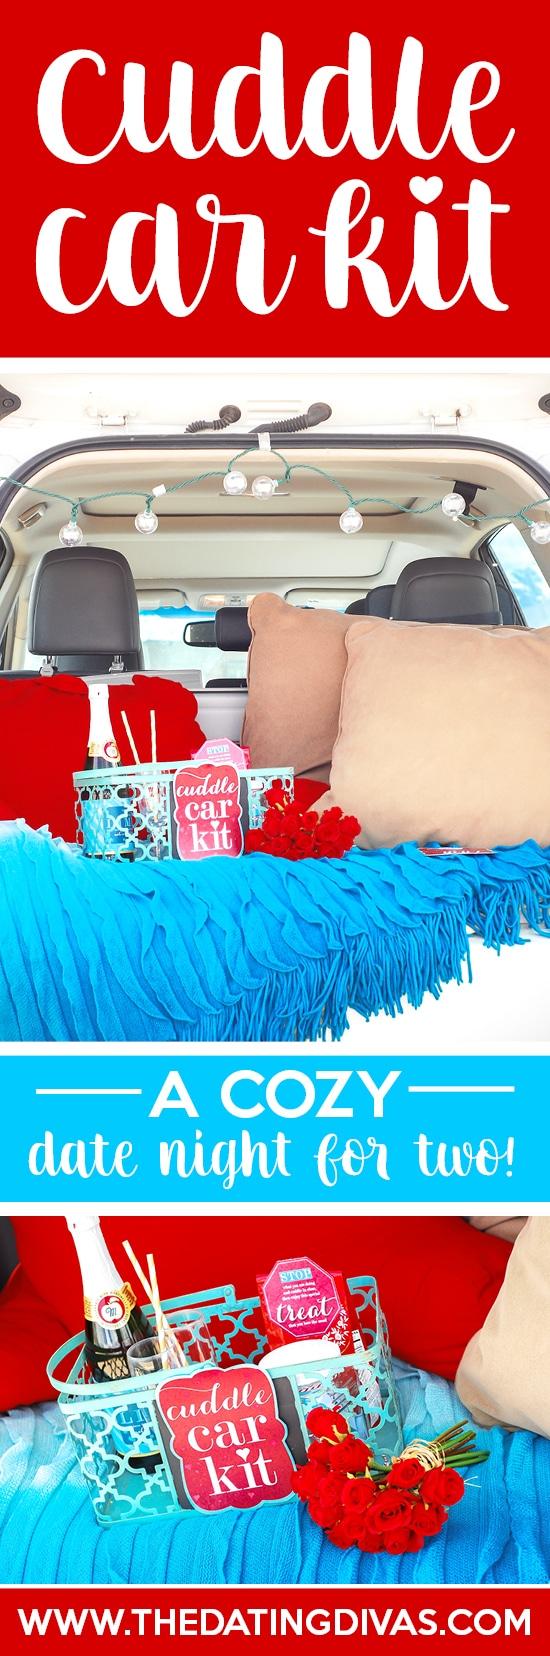 Cuddle Car Kit: An Easy Date Night Idea